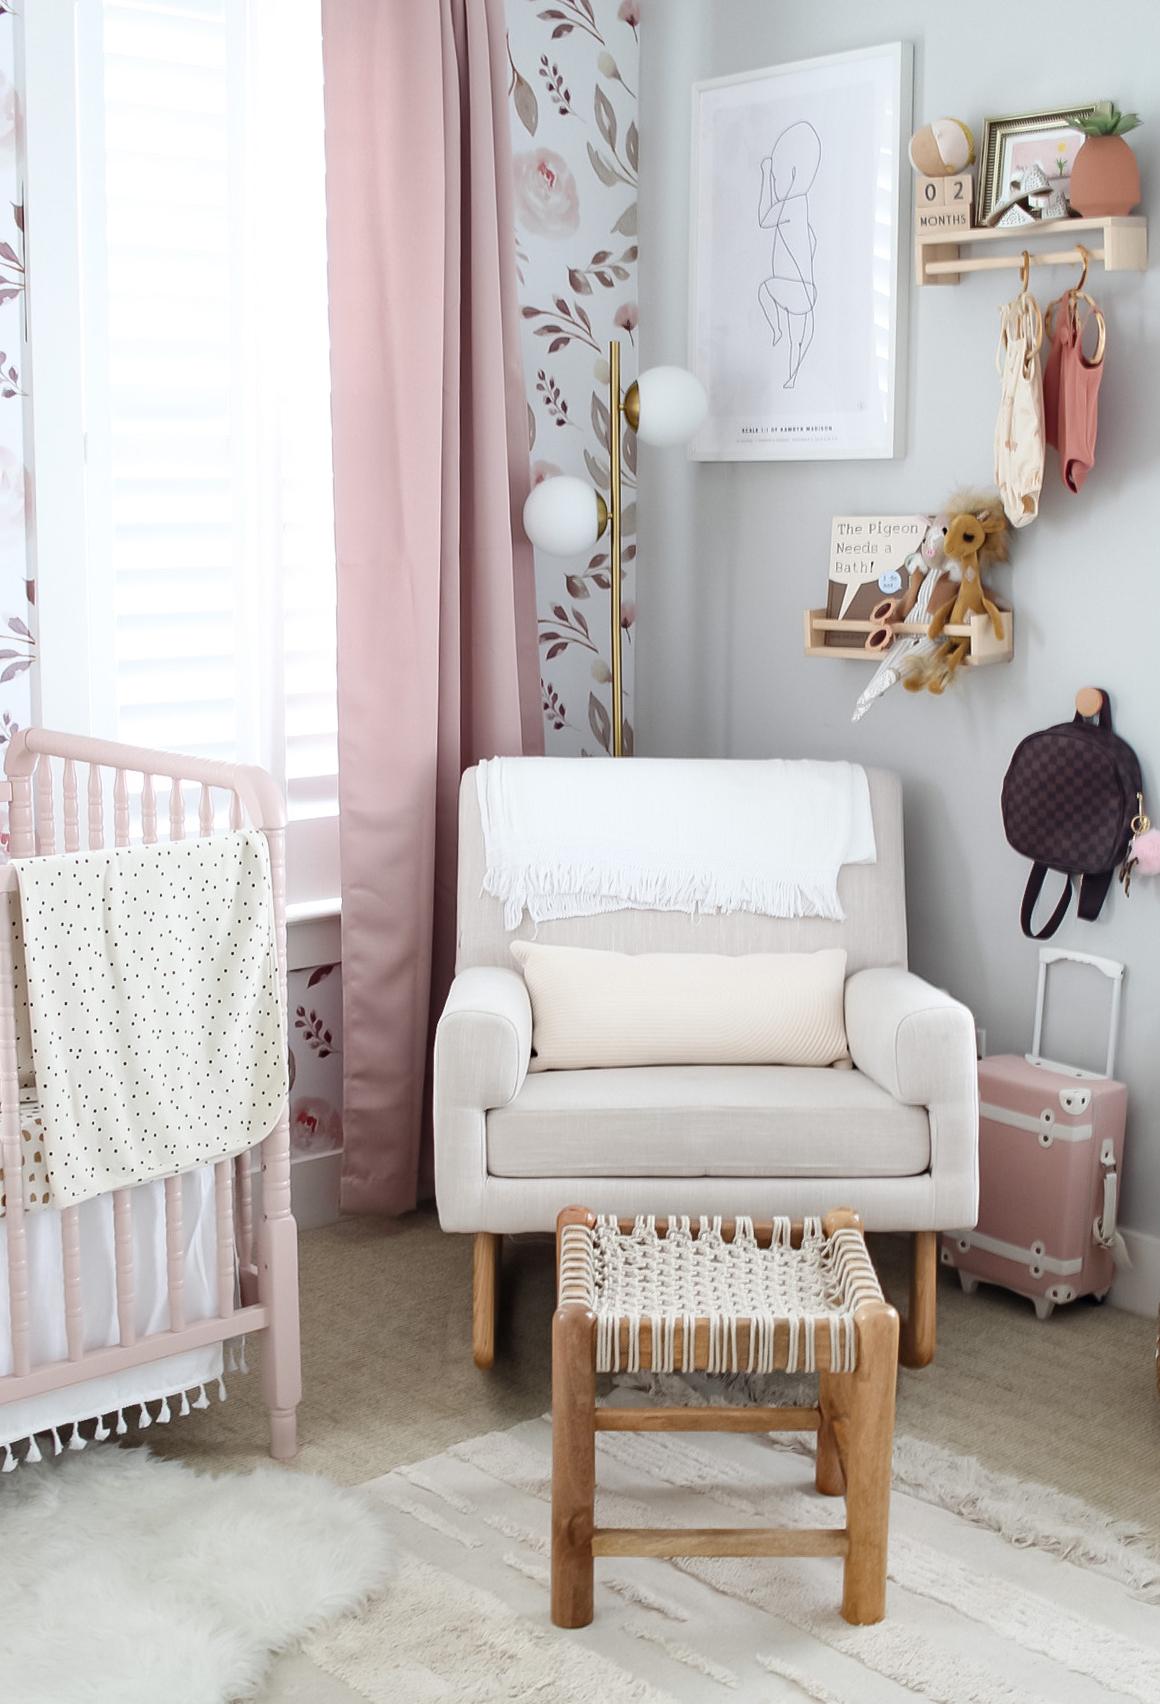 Nursing Nook in Shared Boy and Girl Nursery